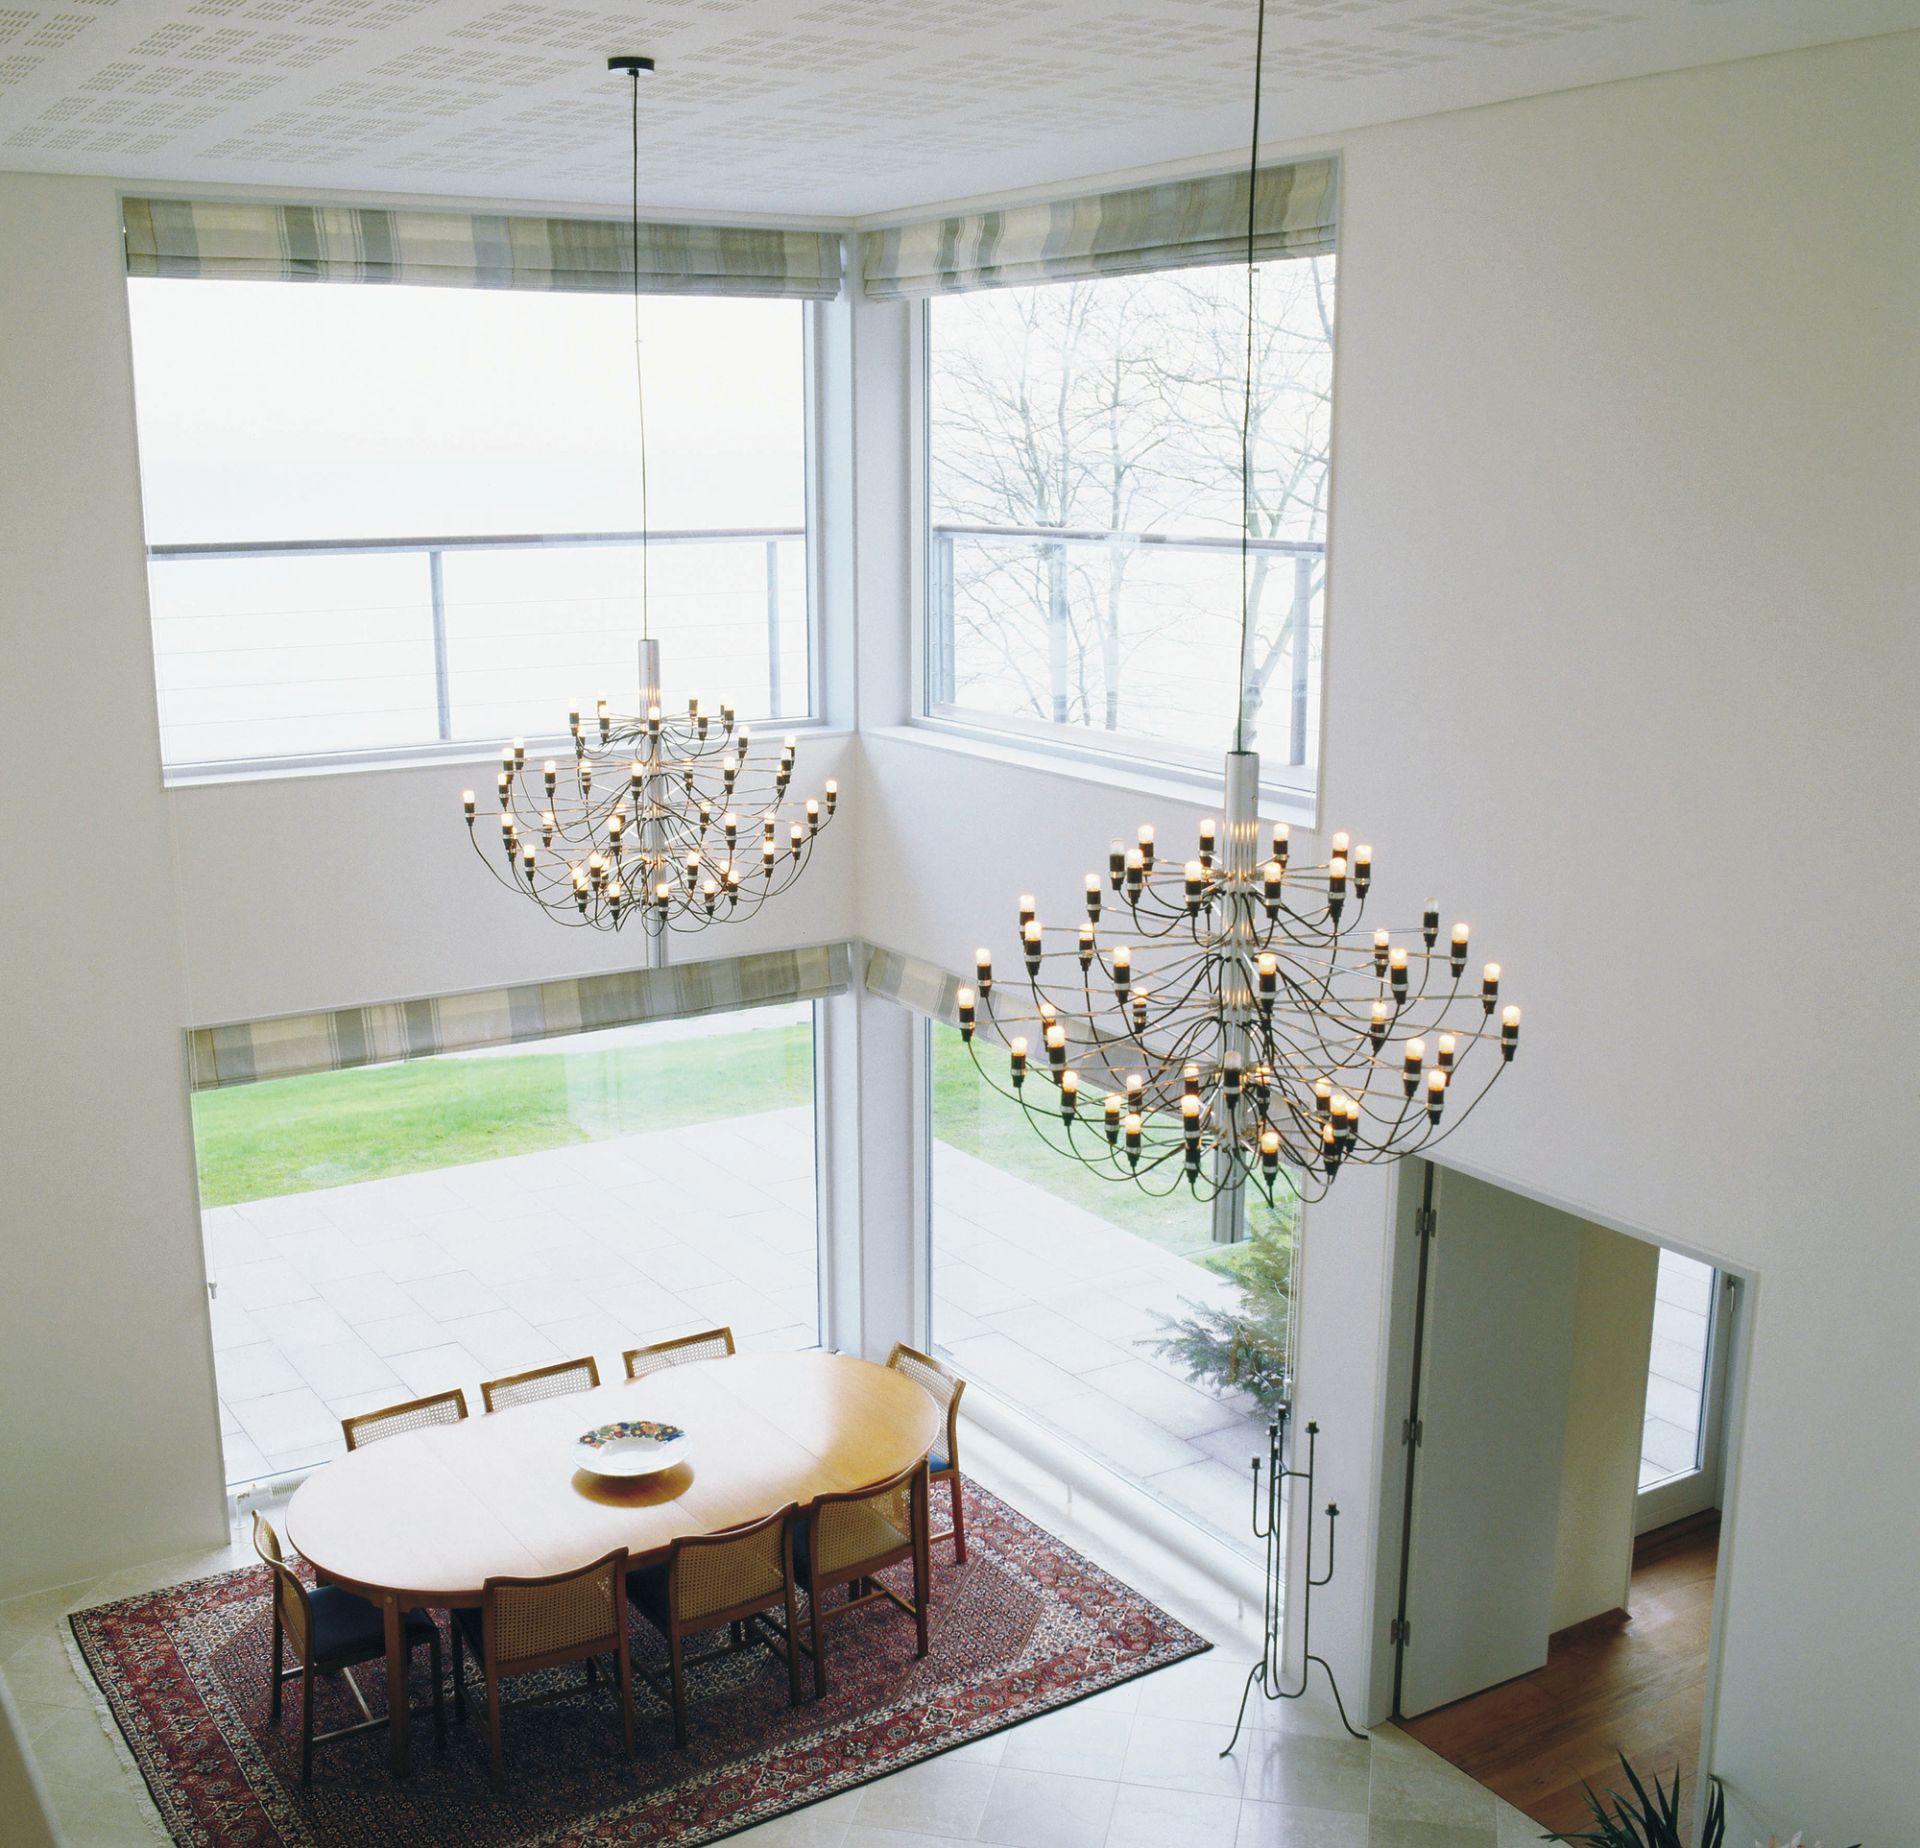 2097 / 30 Pendant lamp LED Flos brass